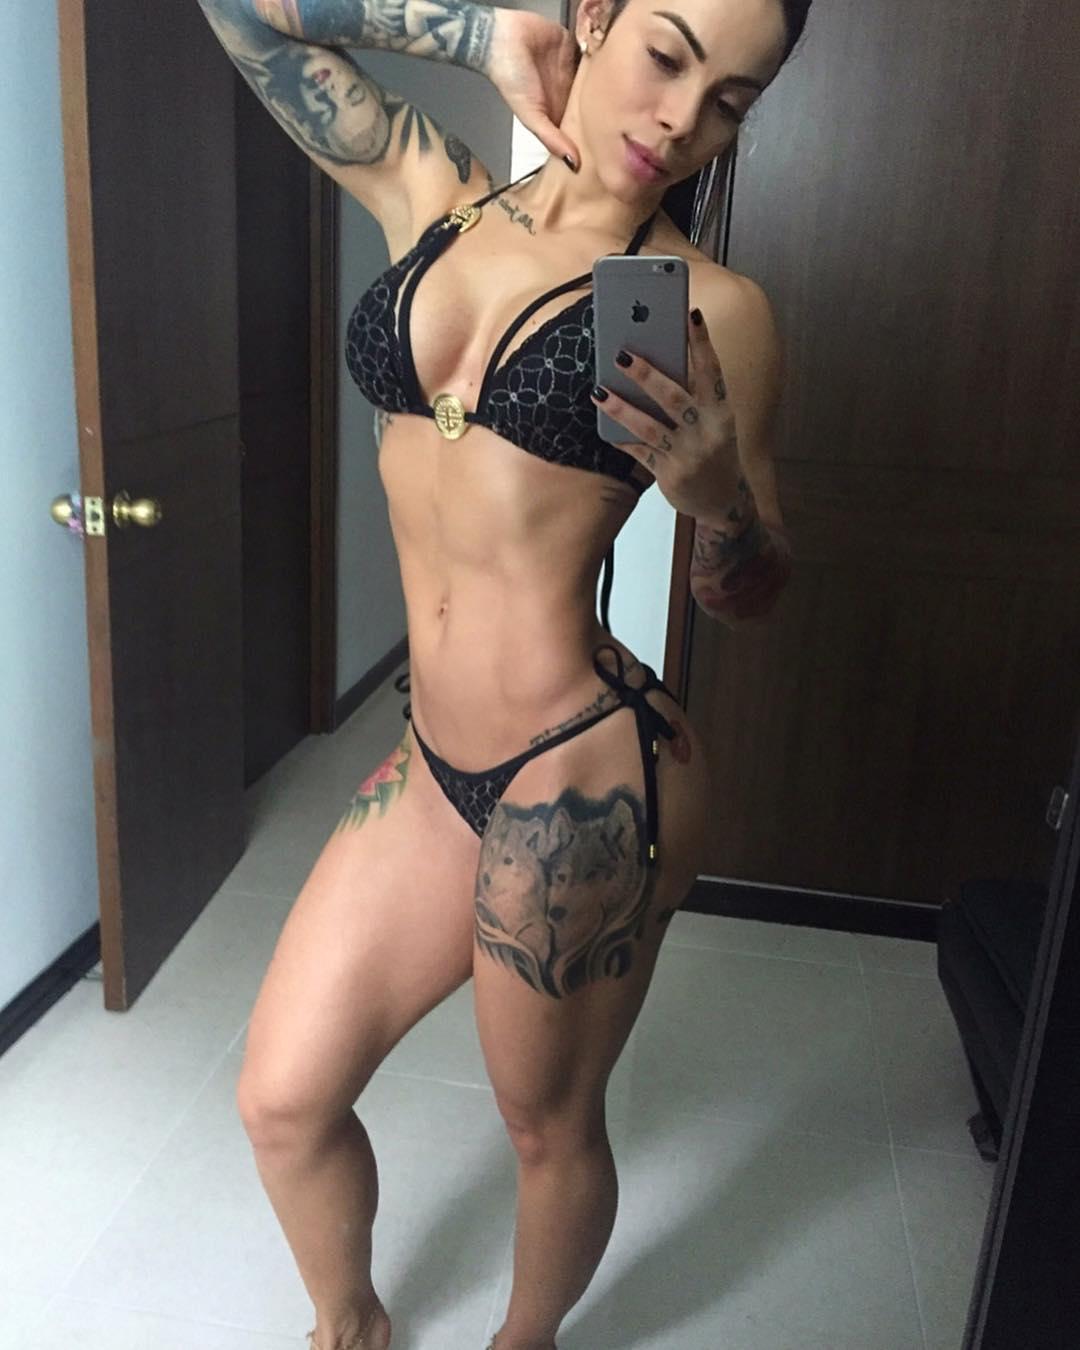 Angelica Chain Nude angelica hernandez porn pic - eporner